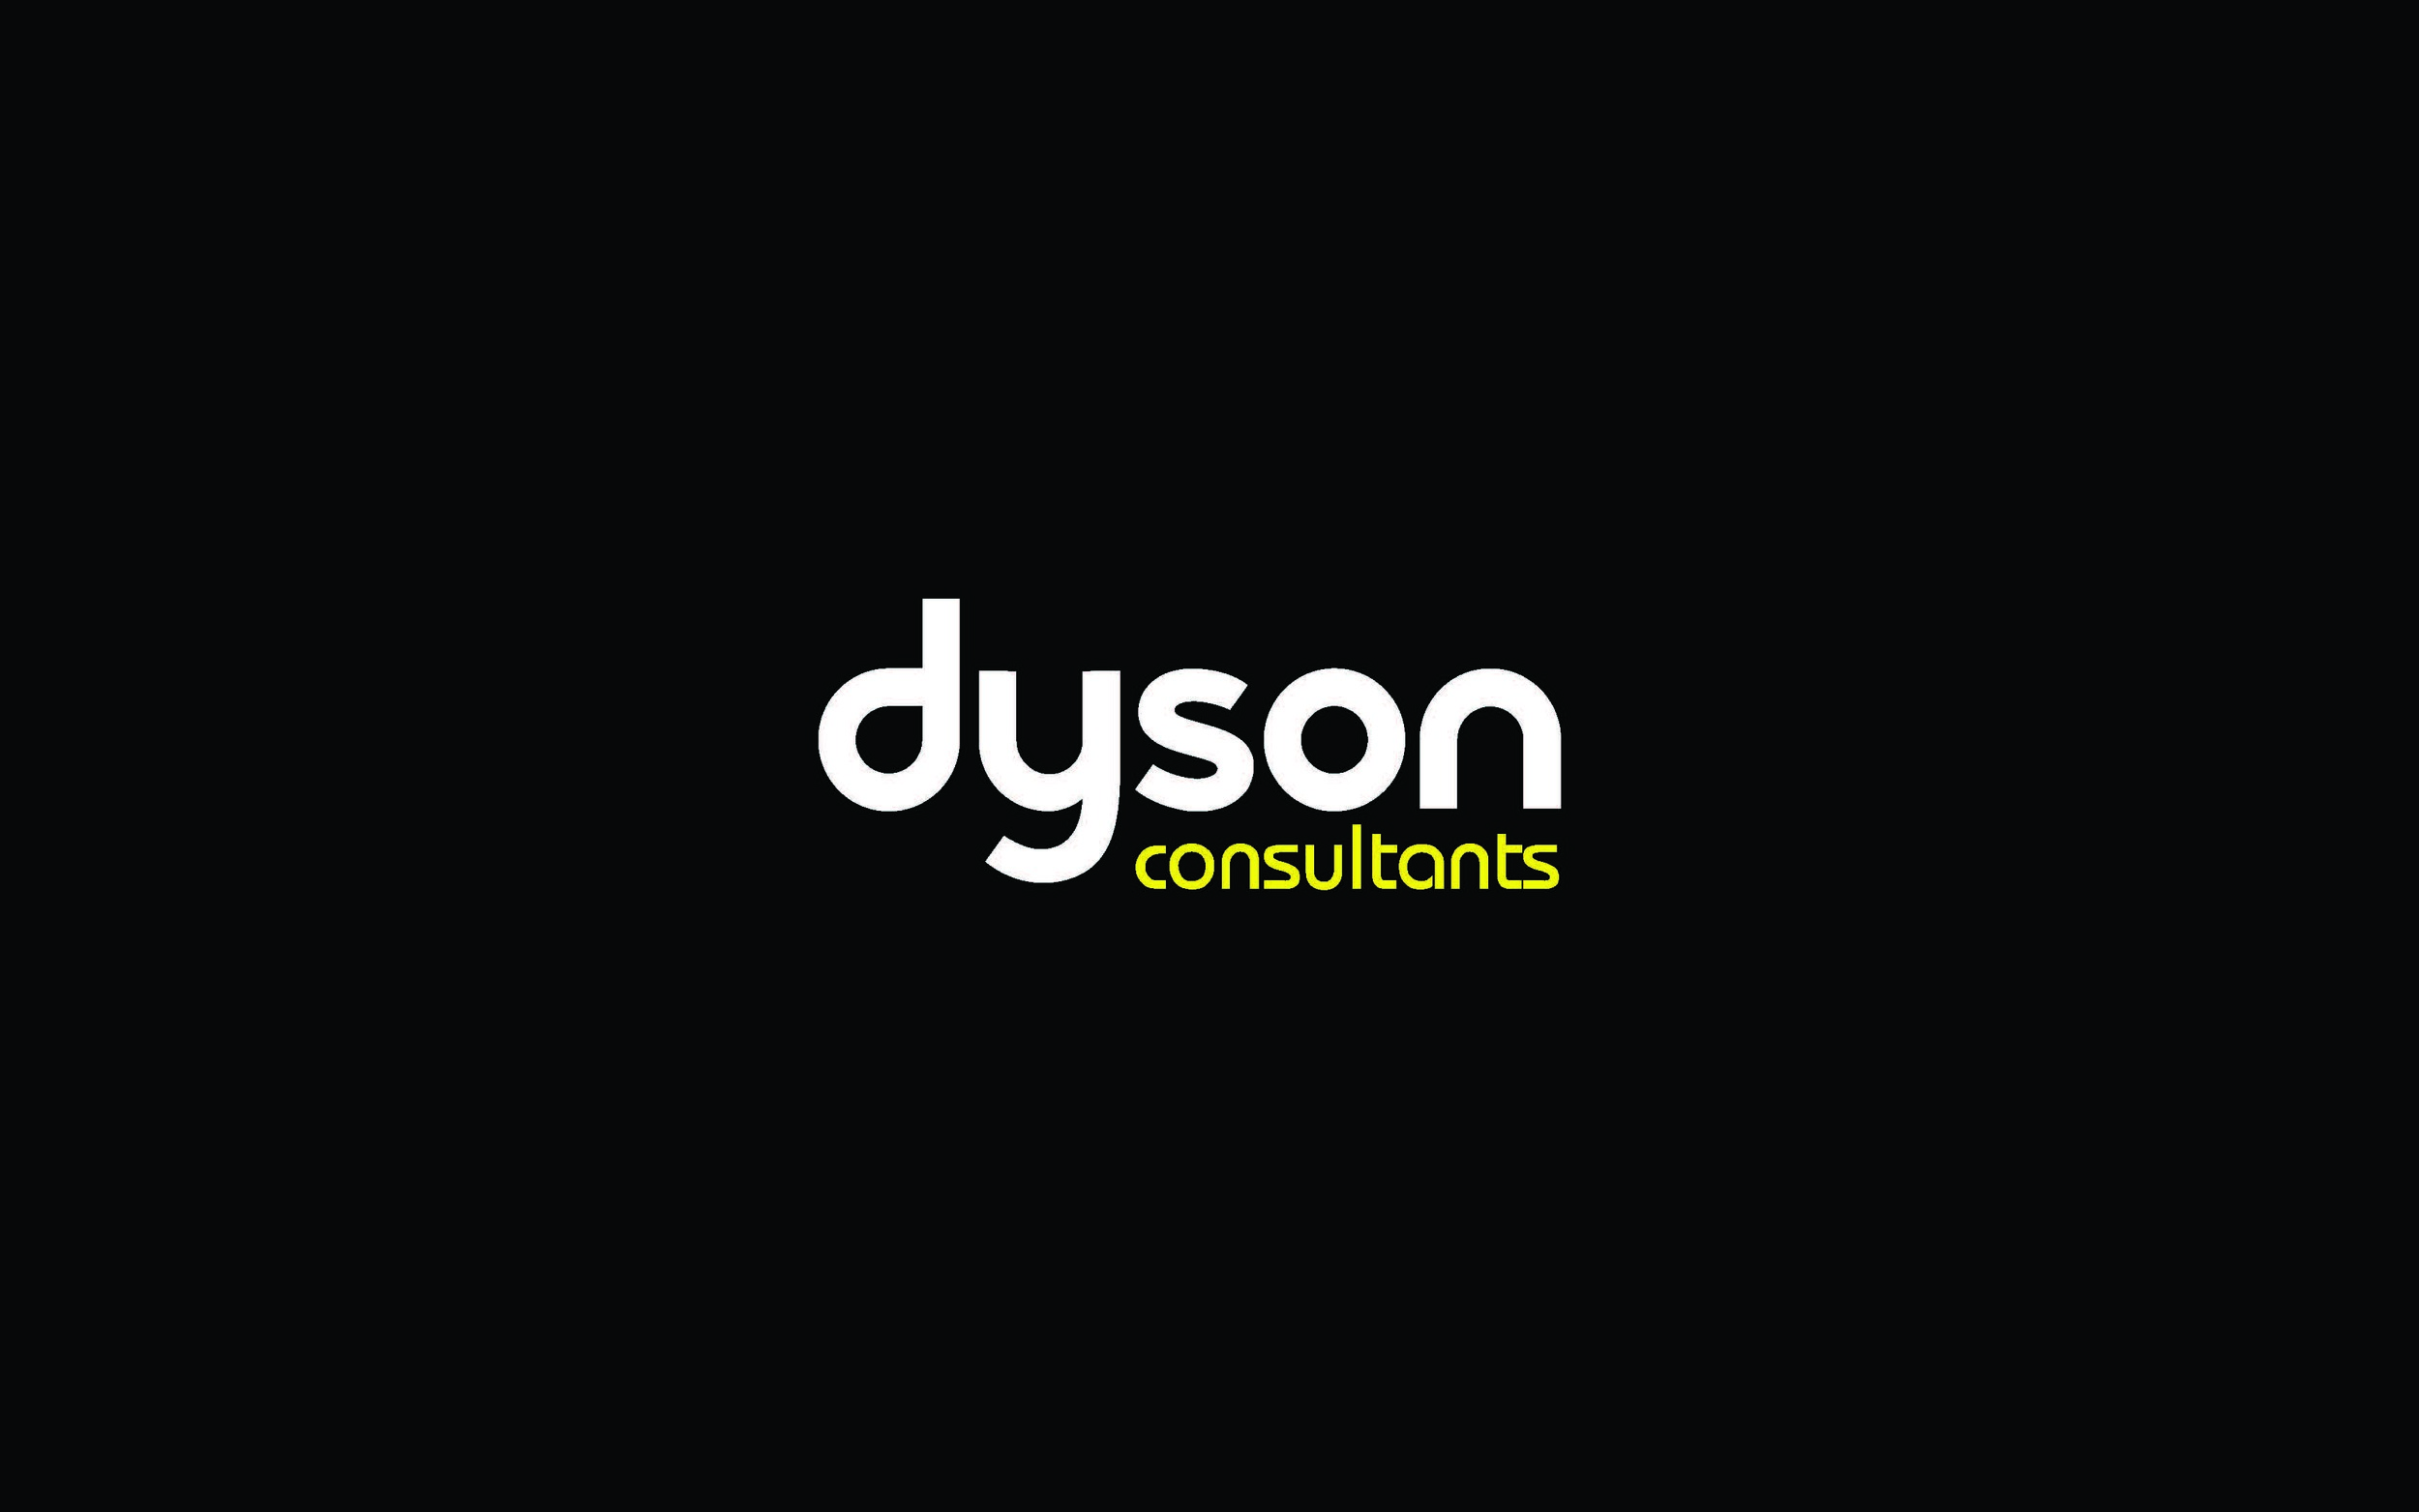 042815_DYSON_FINAL copy_Page_16.jpg